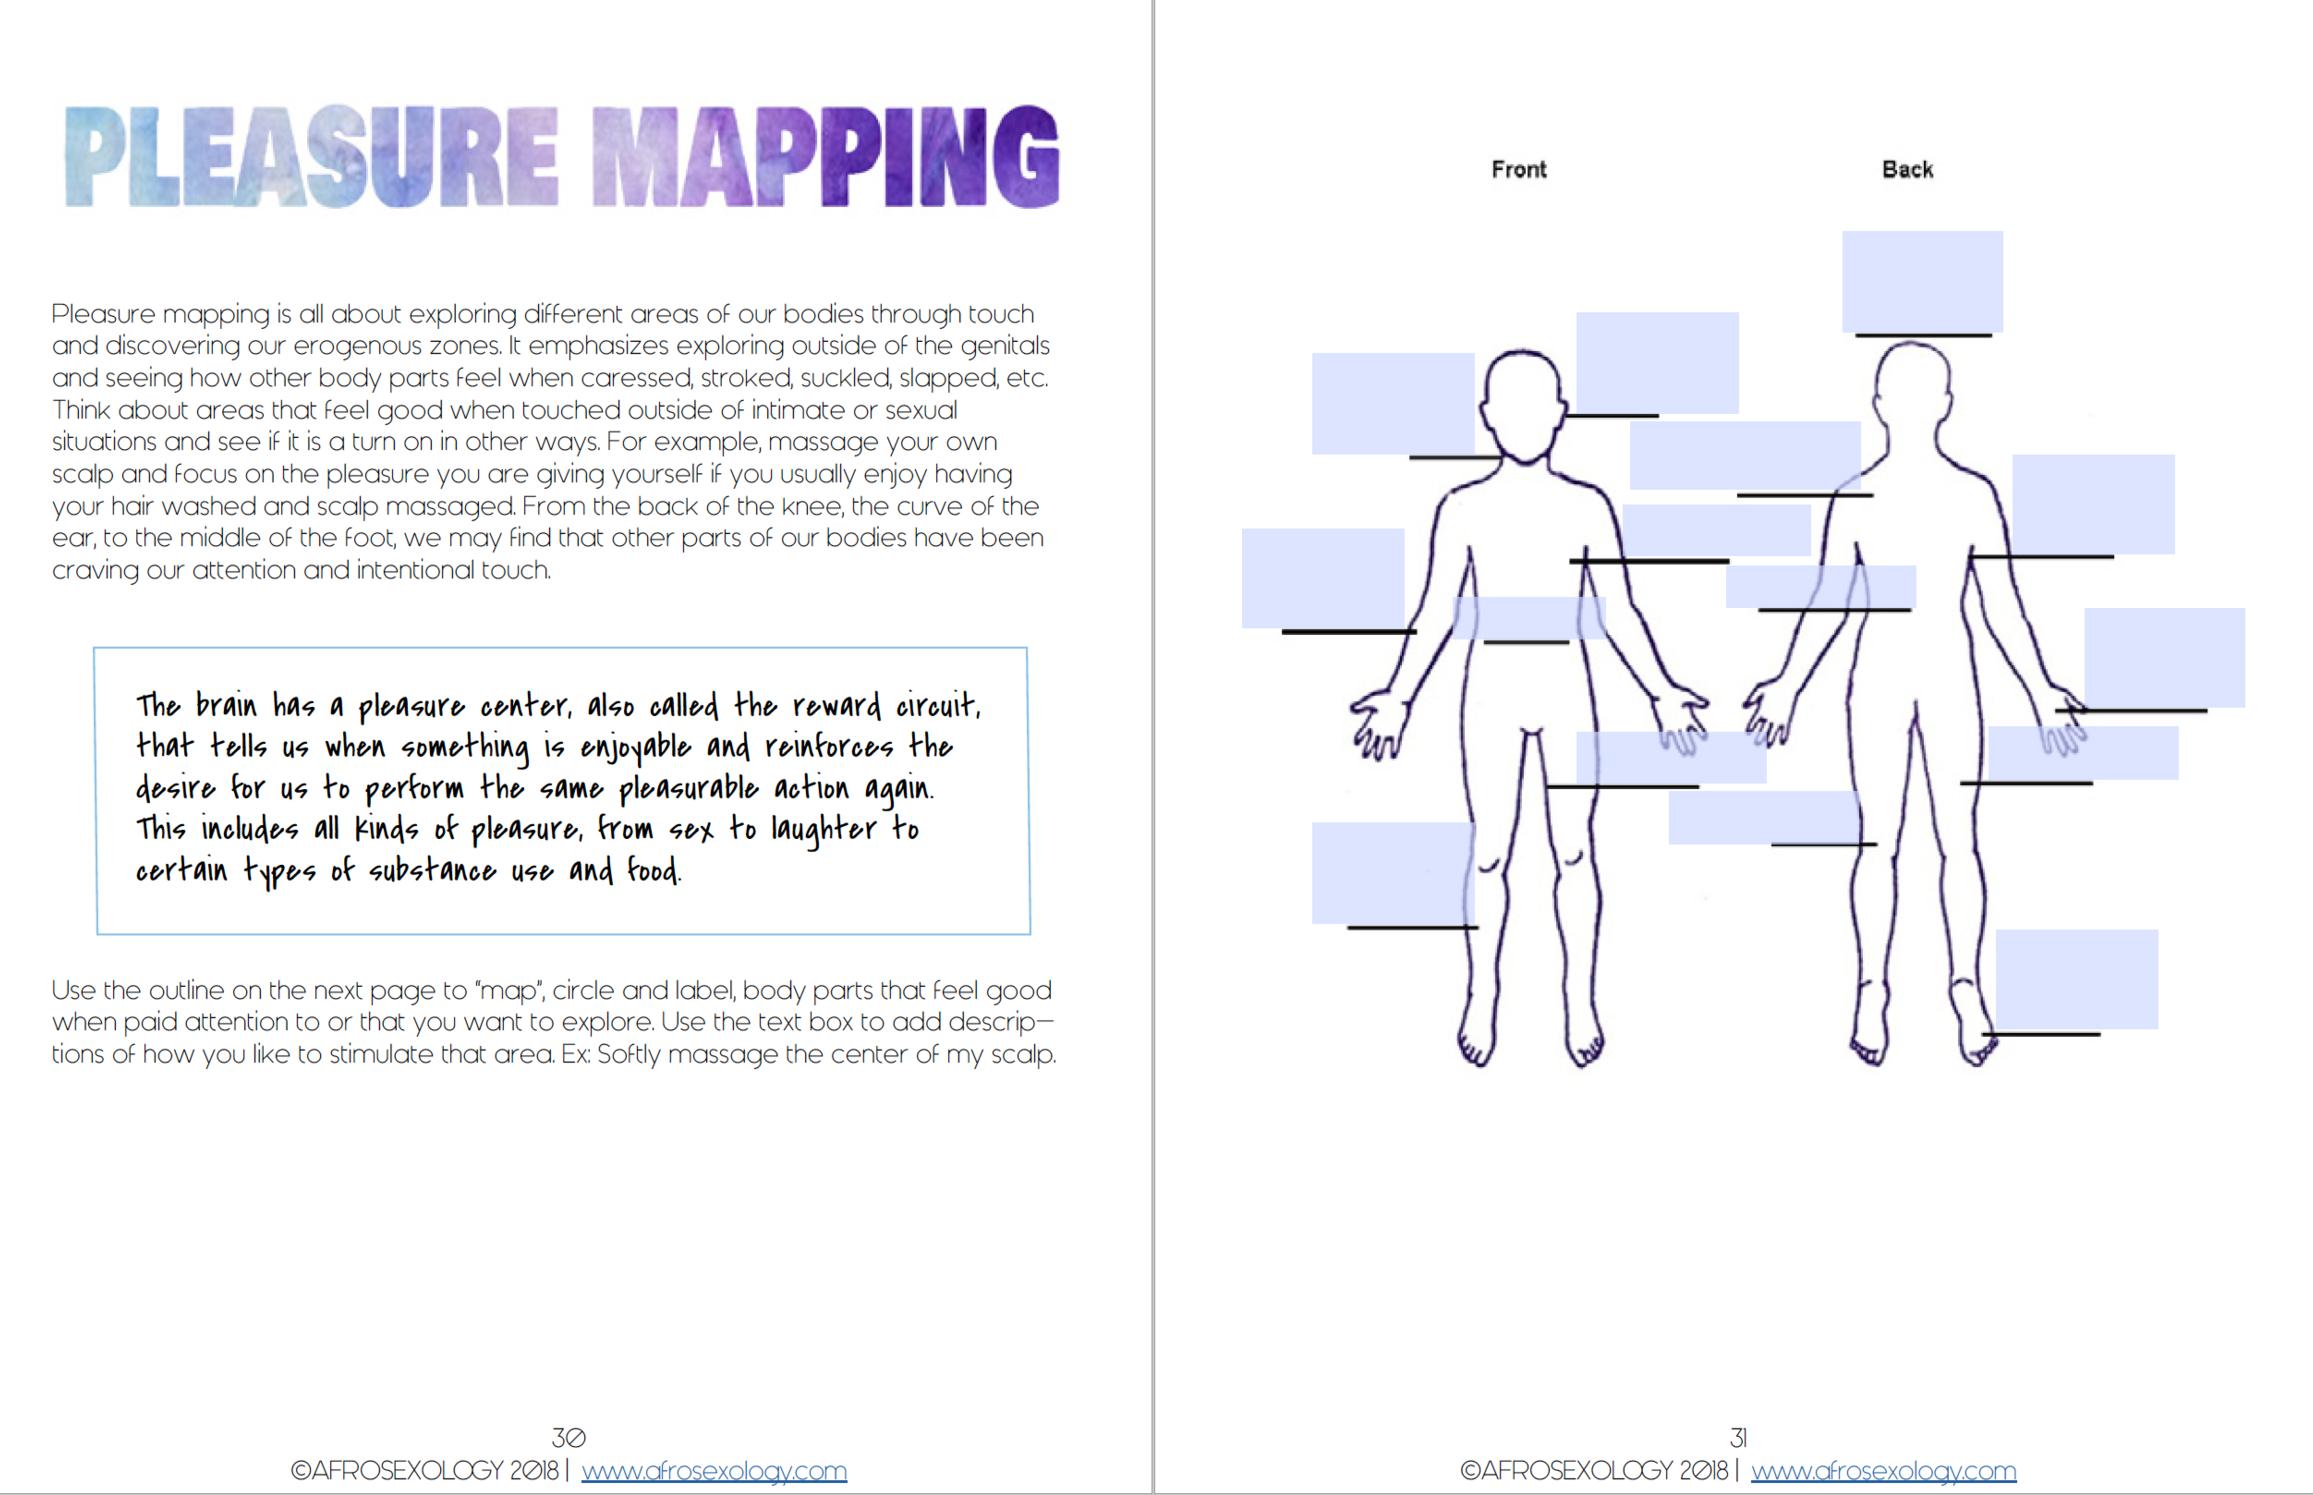 pleasure mapping screenshot.png